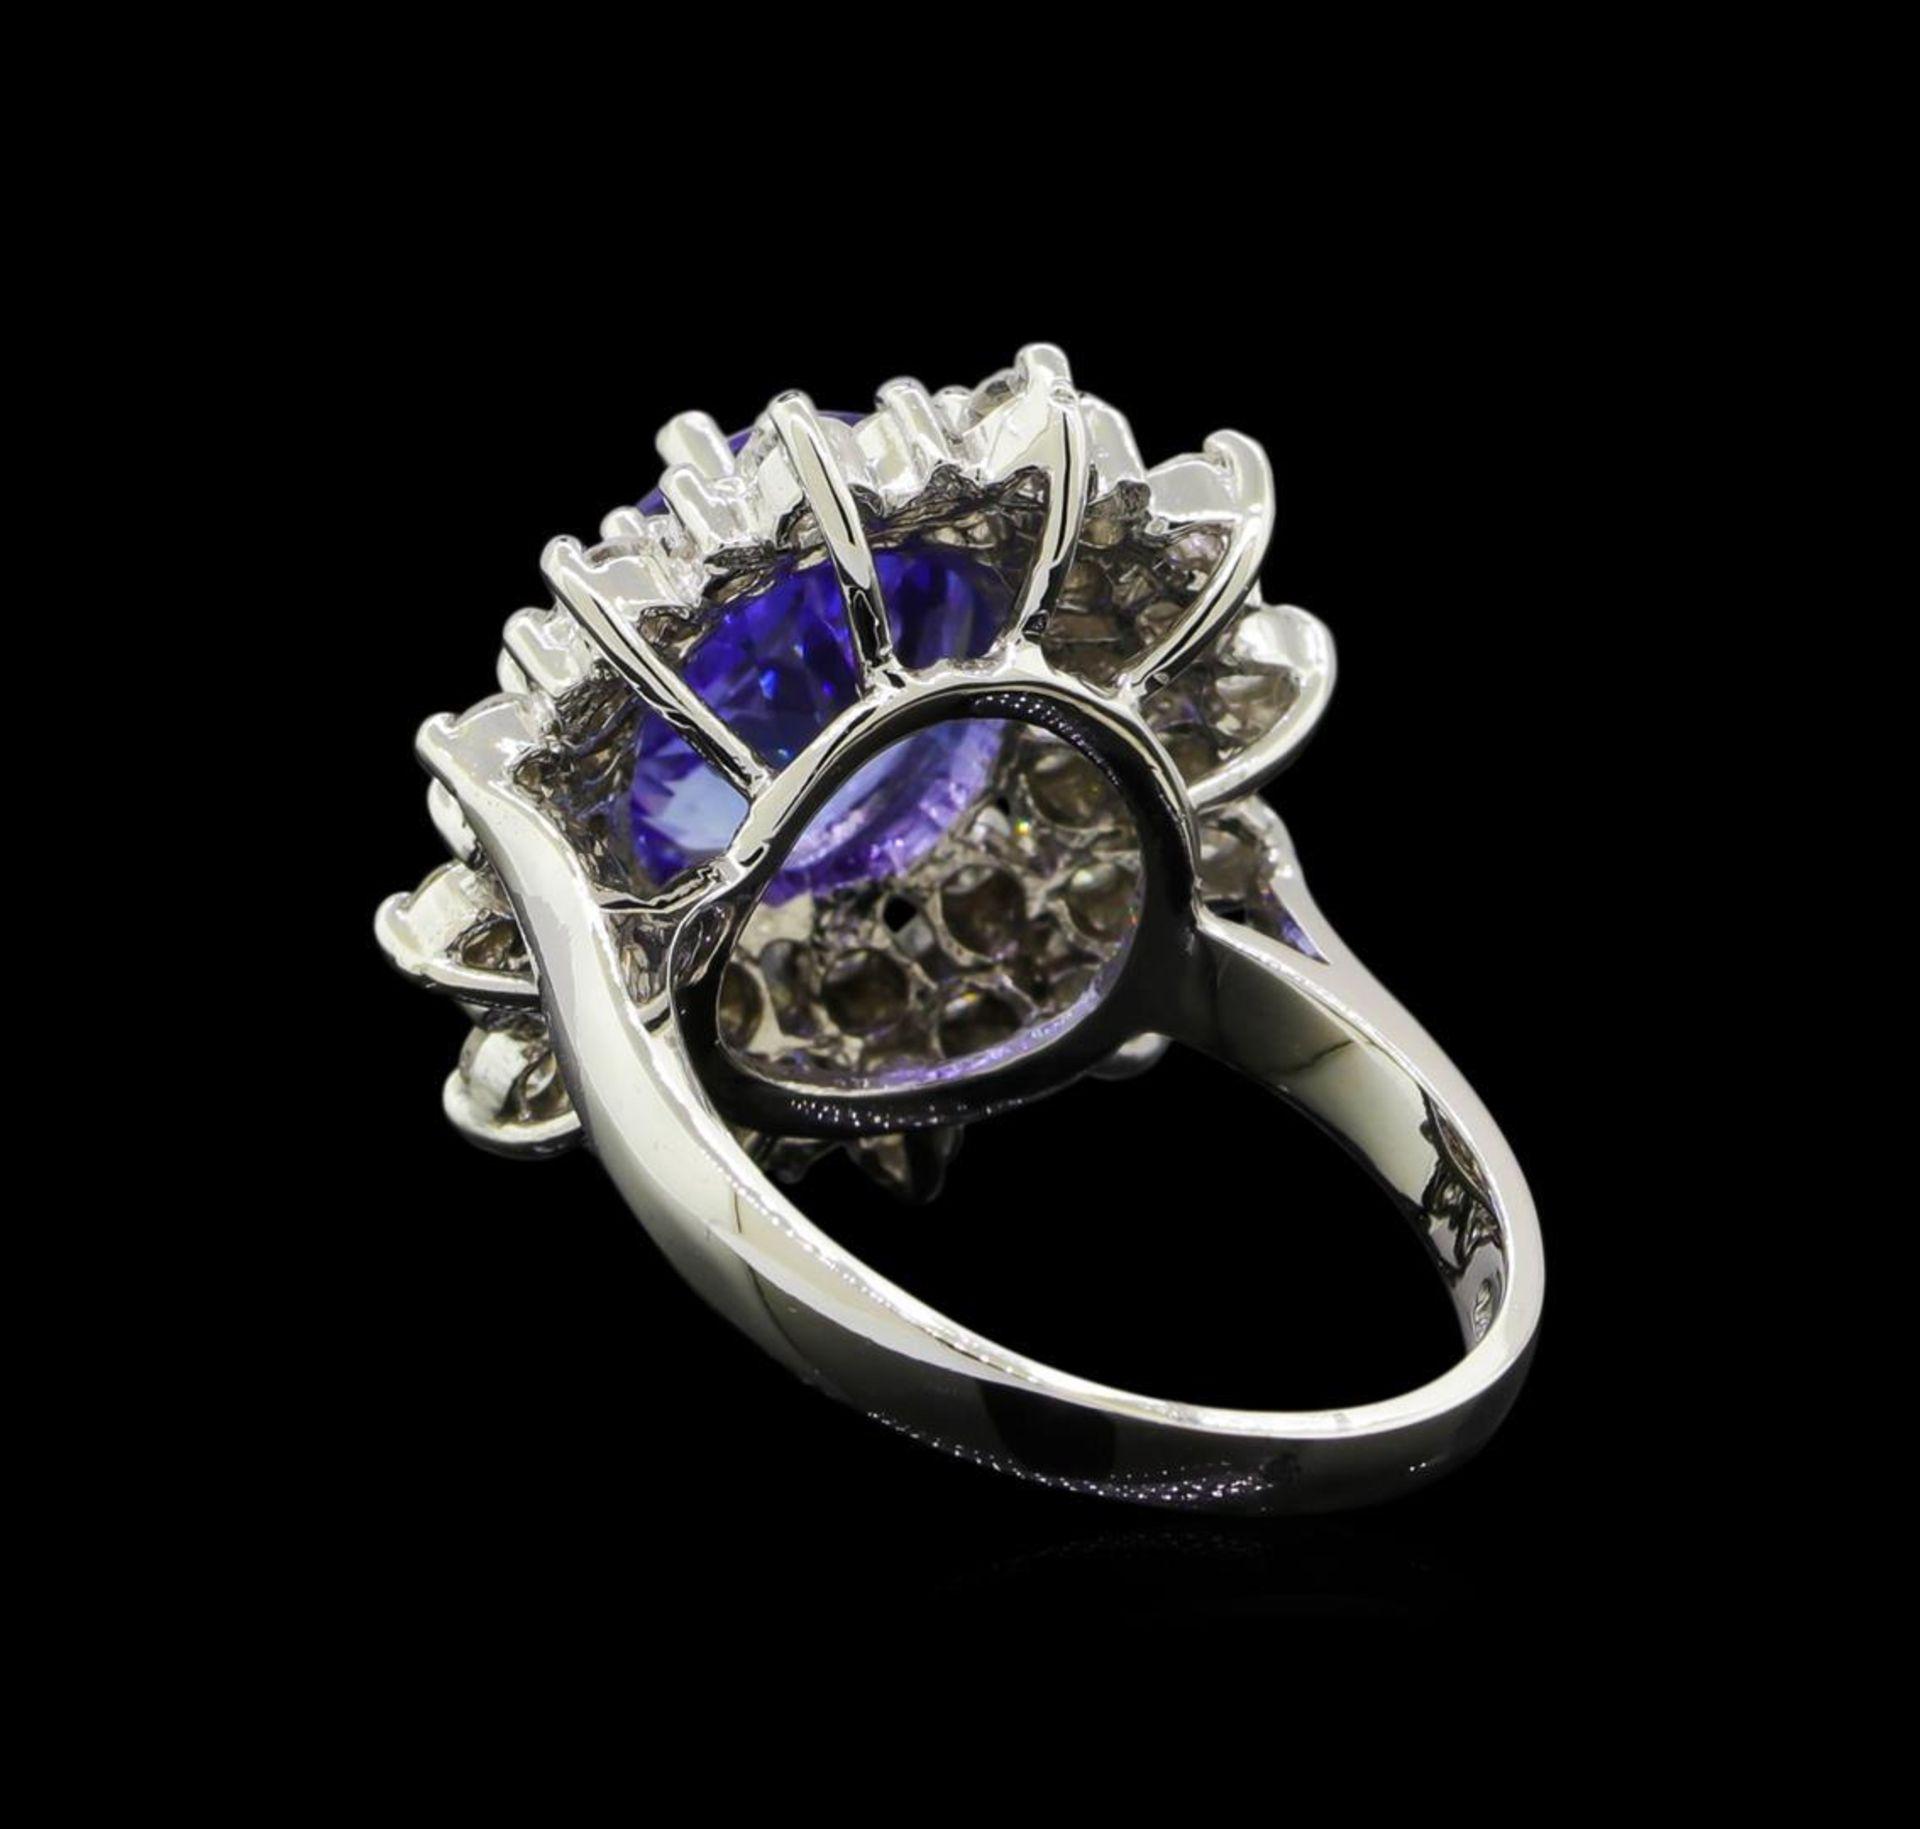 3.90 ctw Tanzanite and Diamond Ring - 14KT White Gold - Image 3 of 5